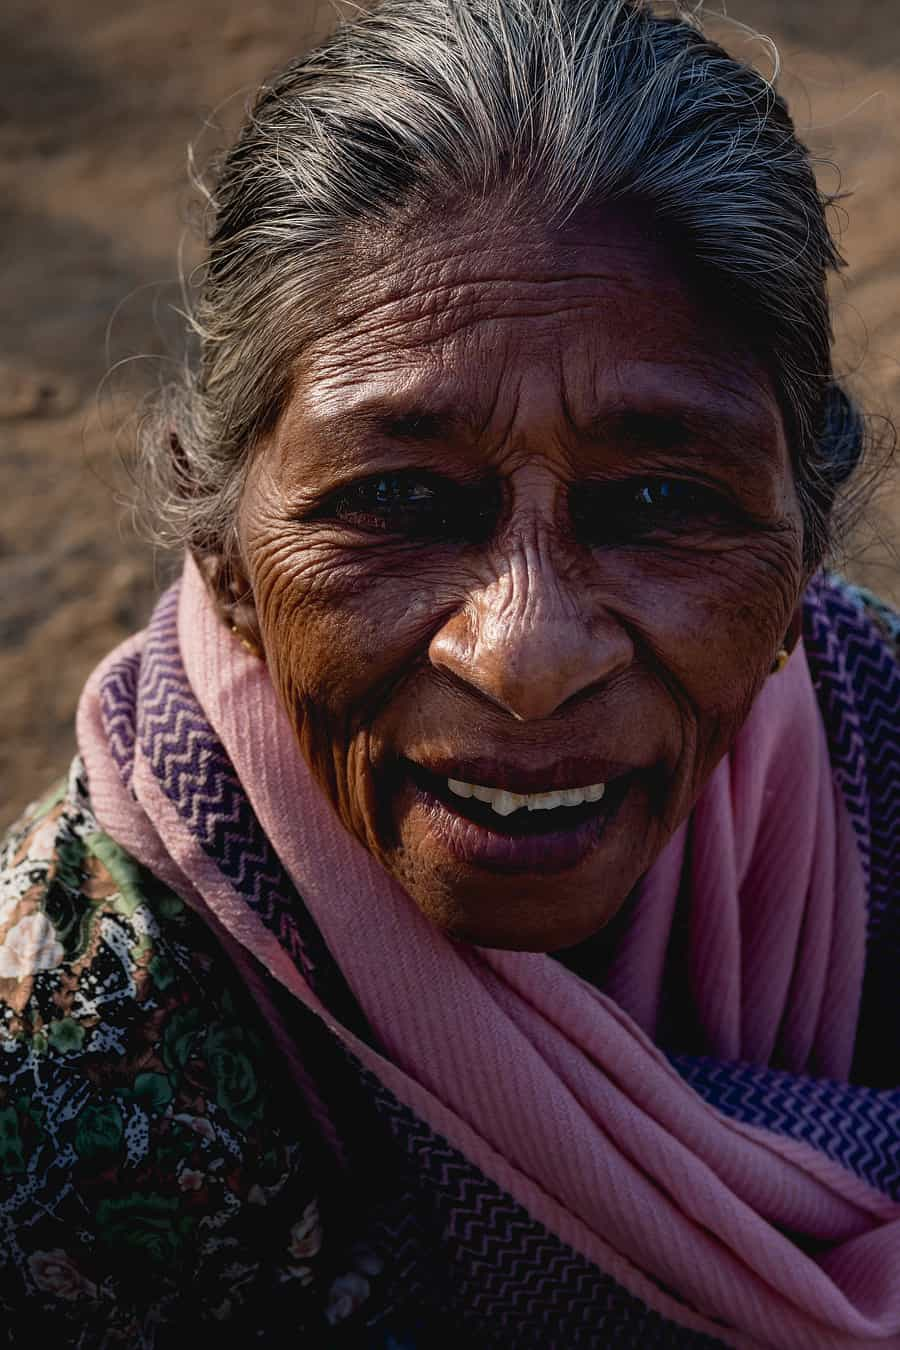 india travel photography0084